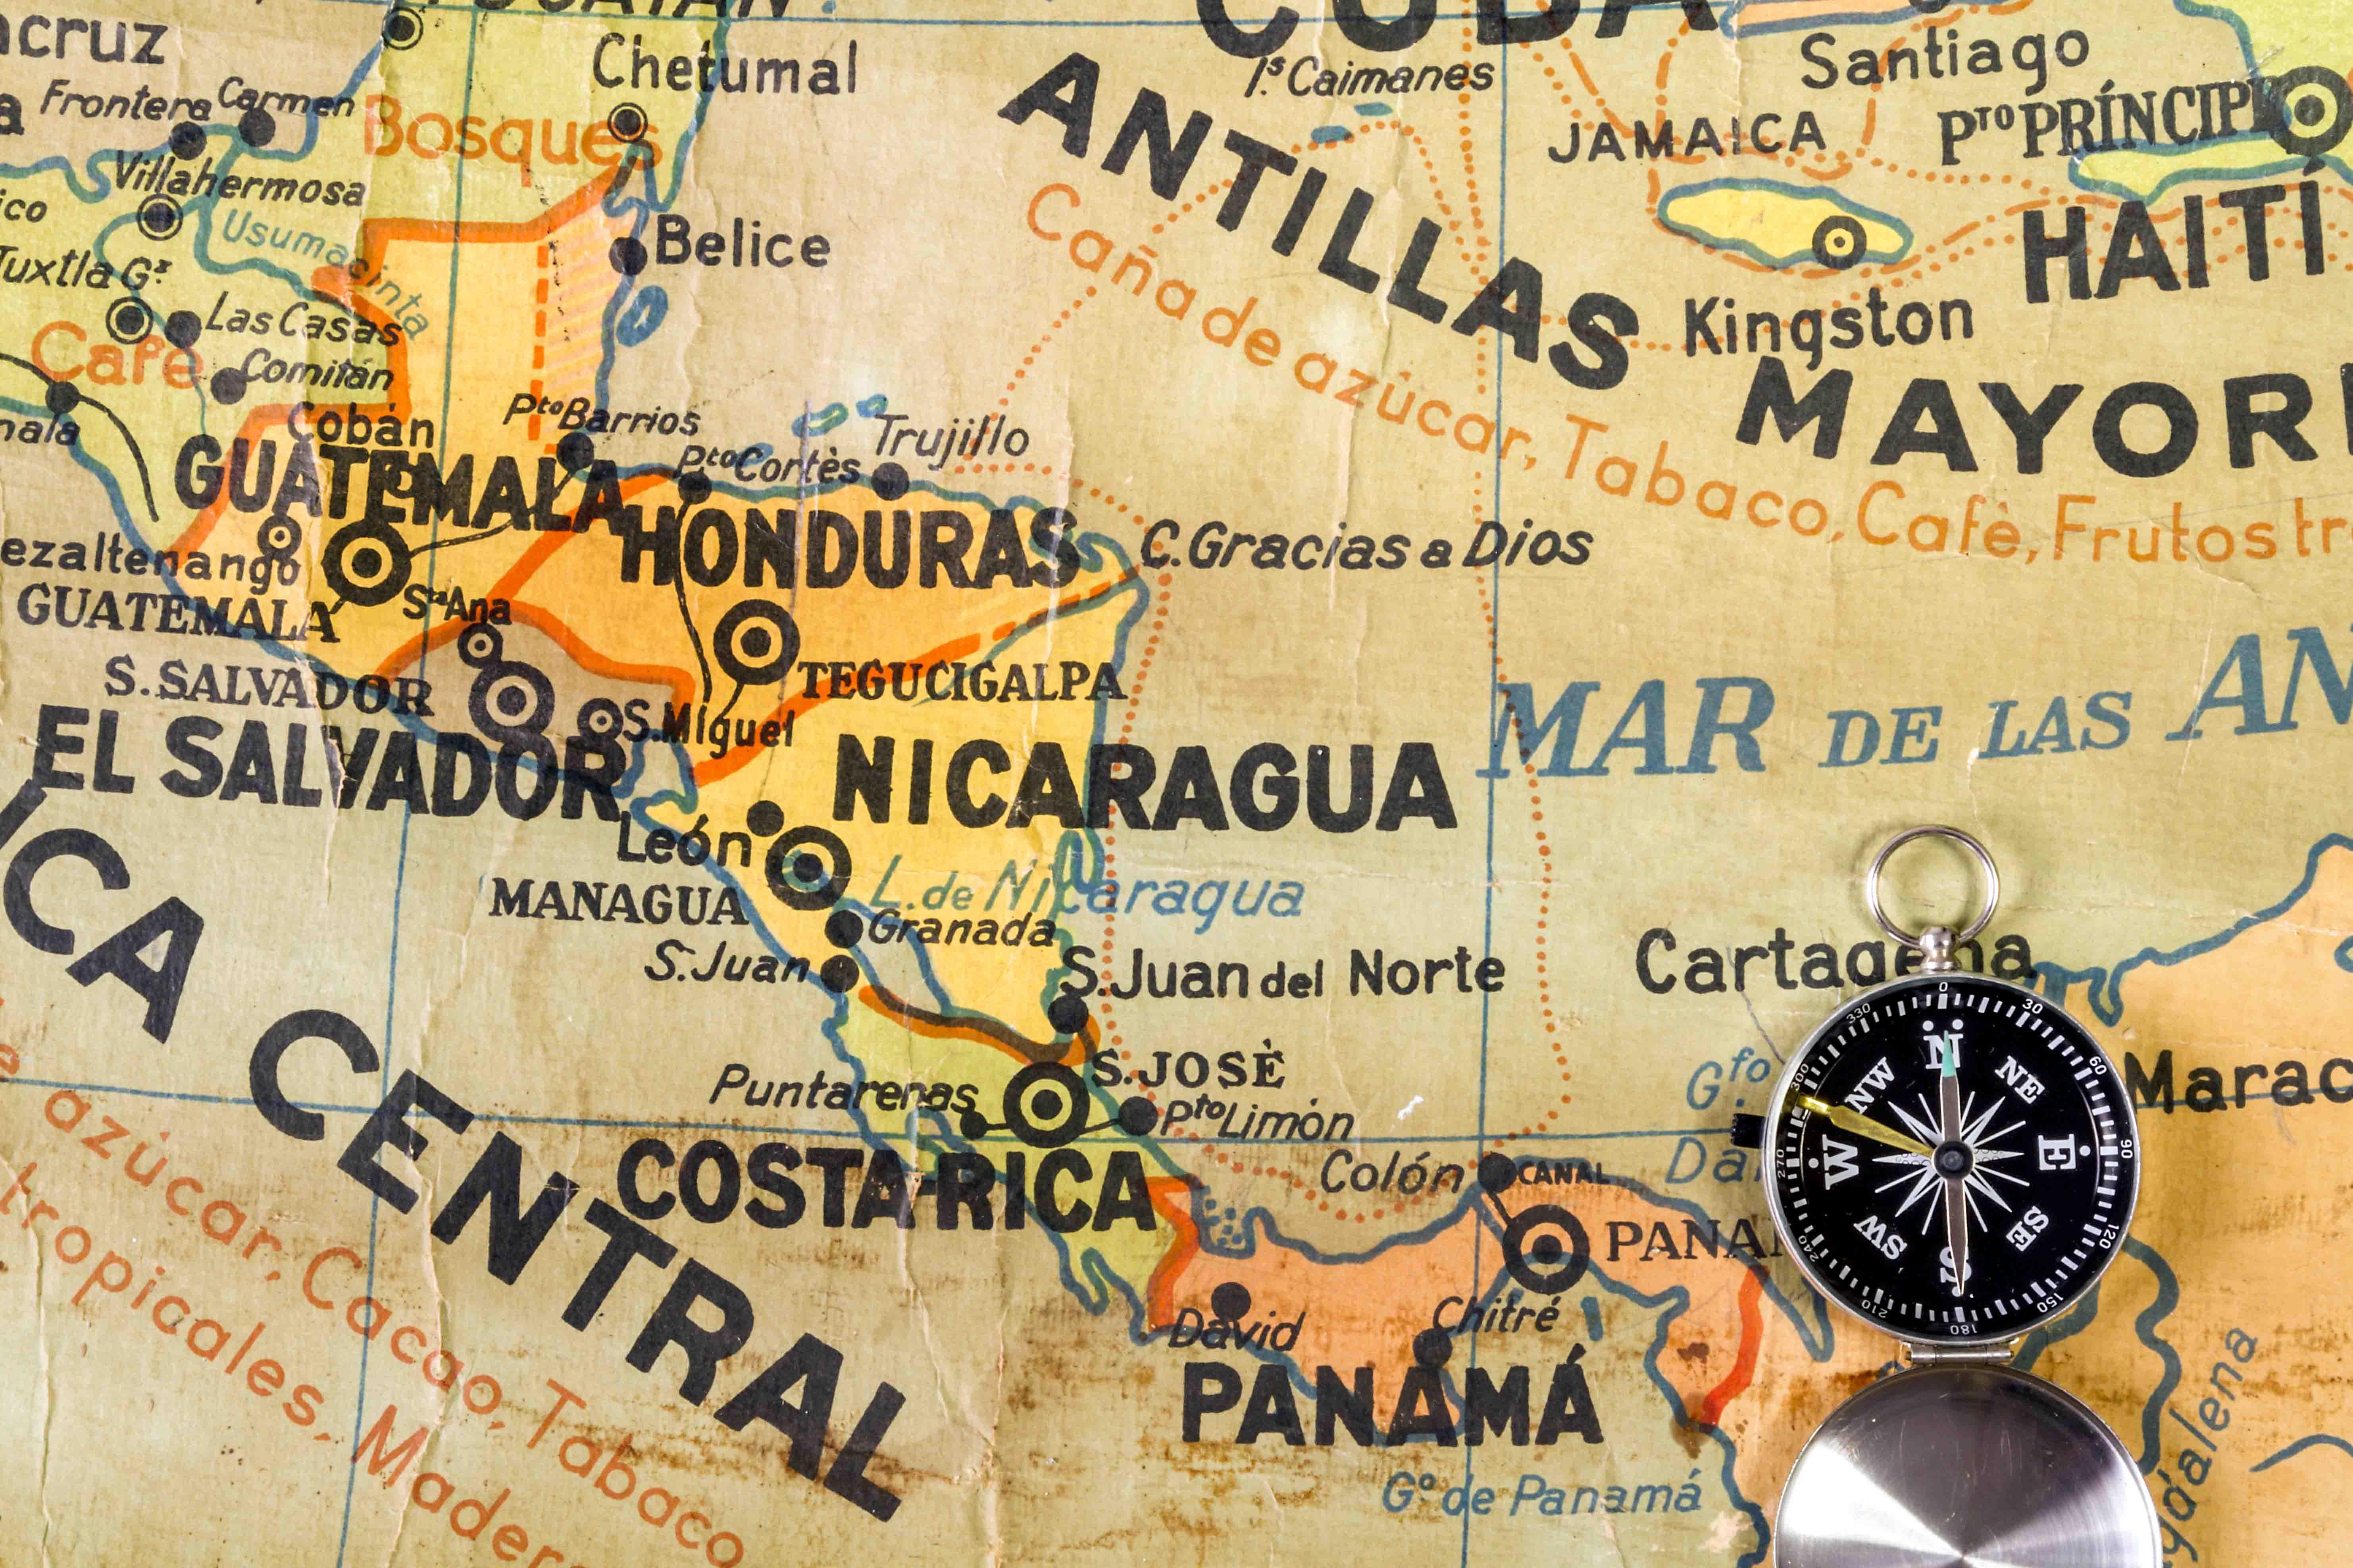 Panamá dará apoyo a Costa Rica y Nicaragua por impacto de Huracán Otto